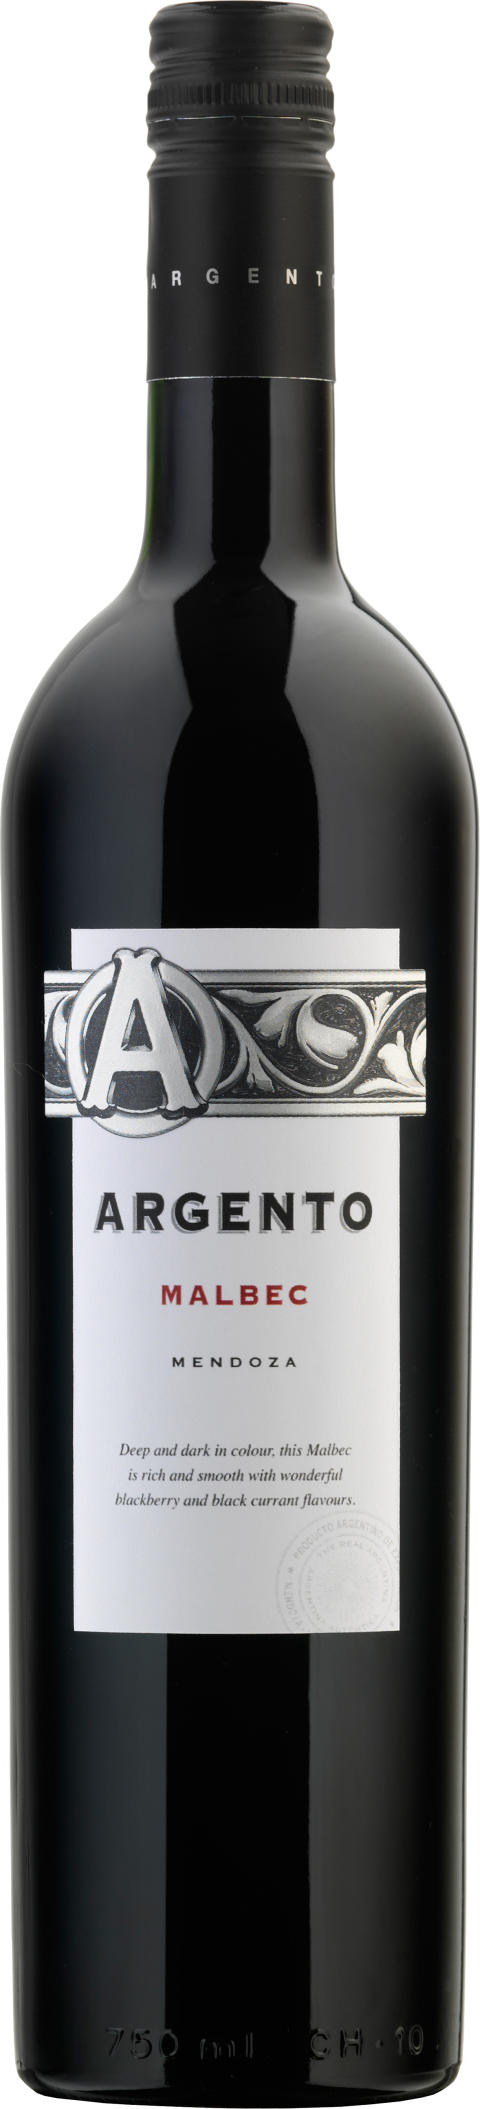 Argento Malbec 750ml 6649